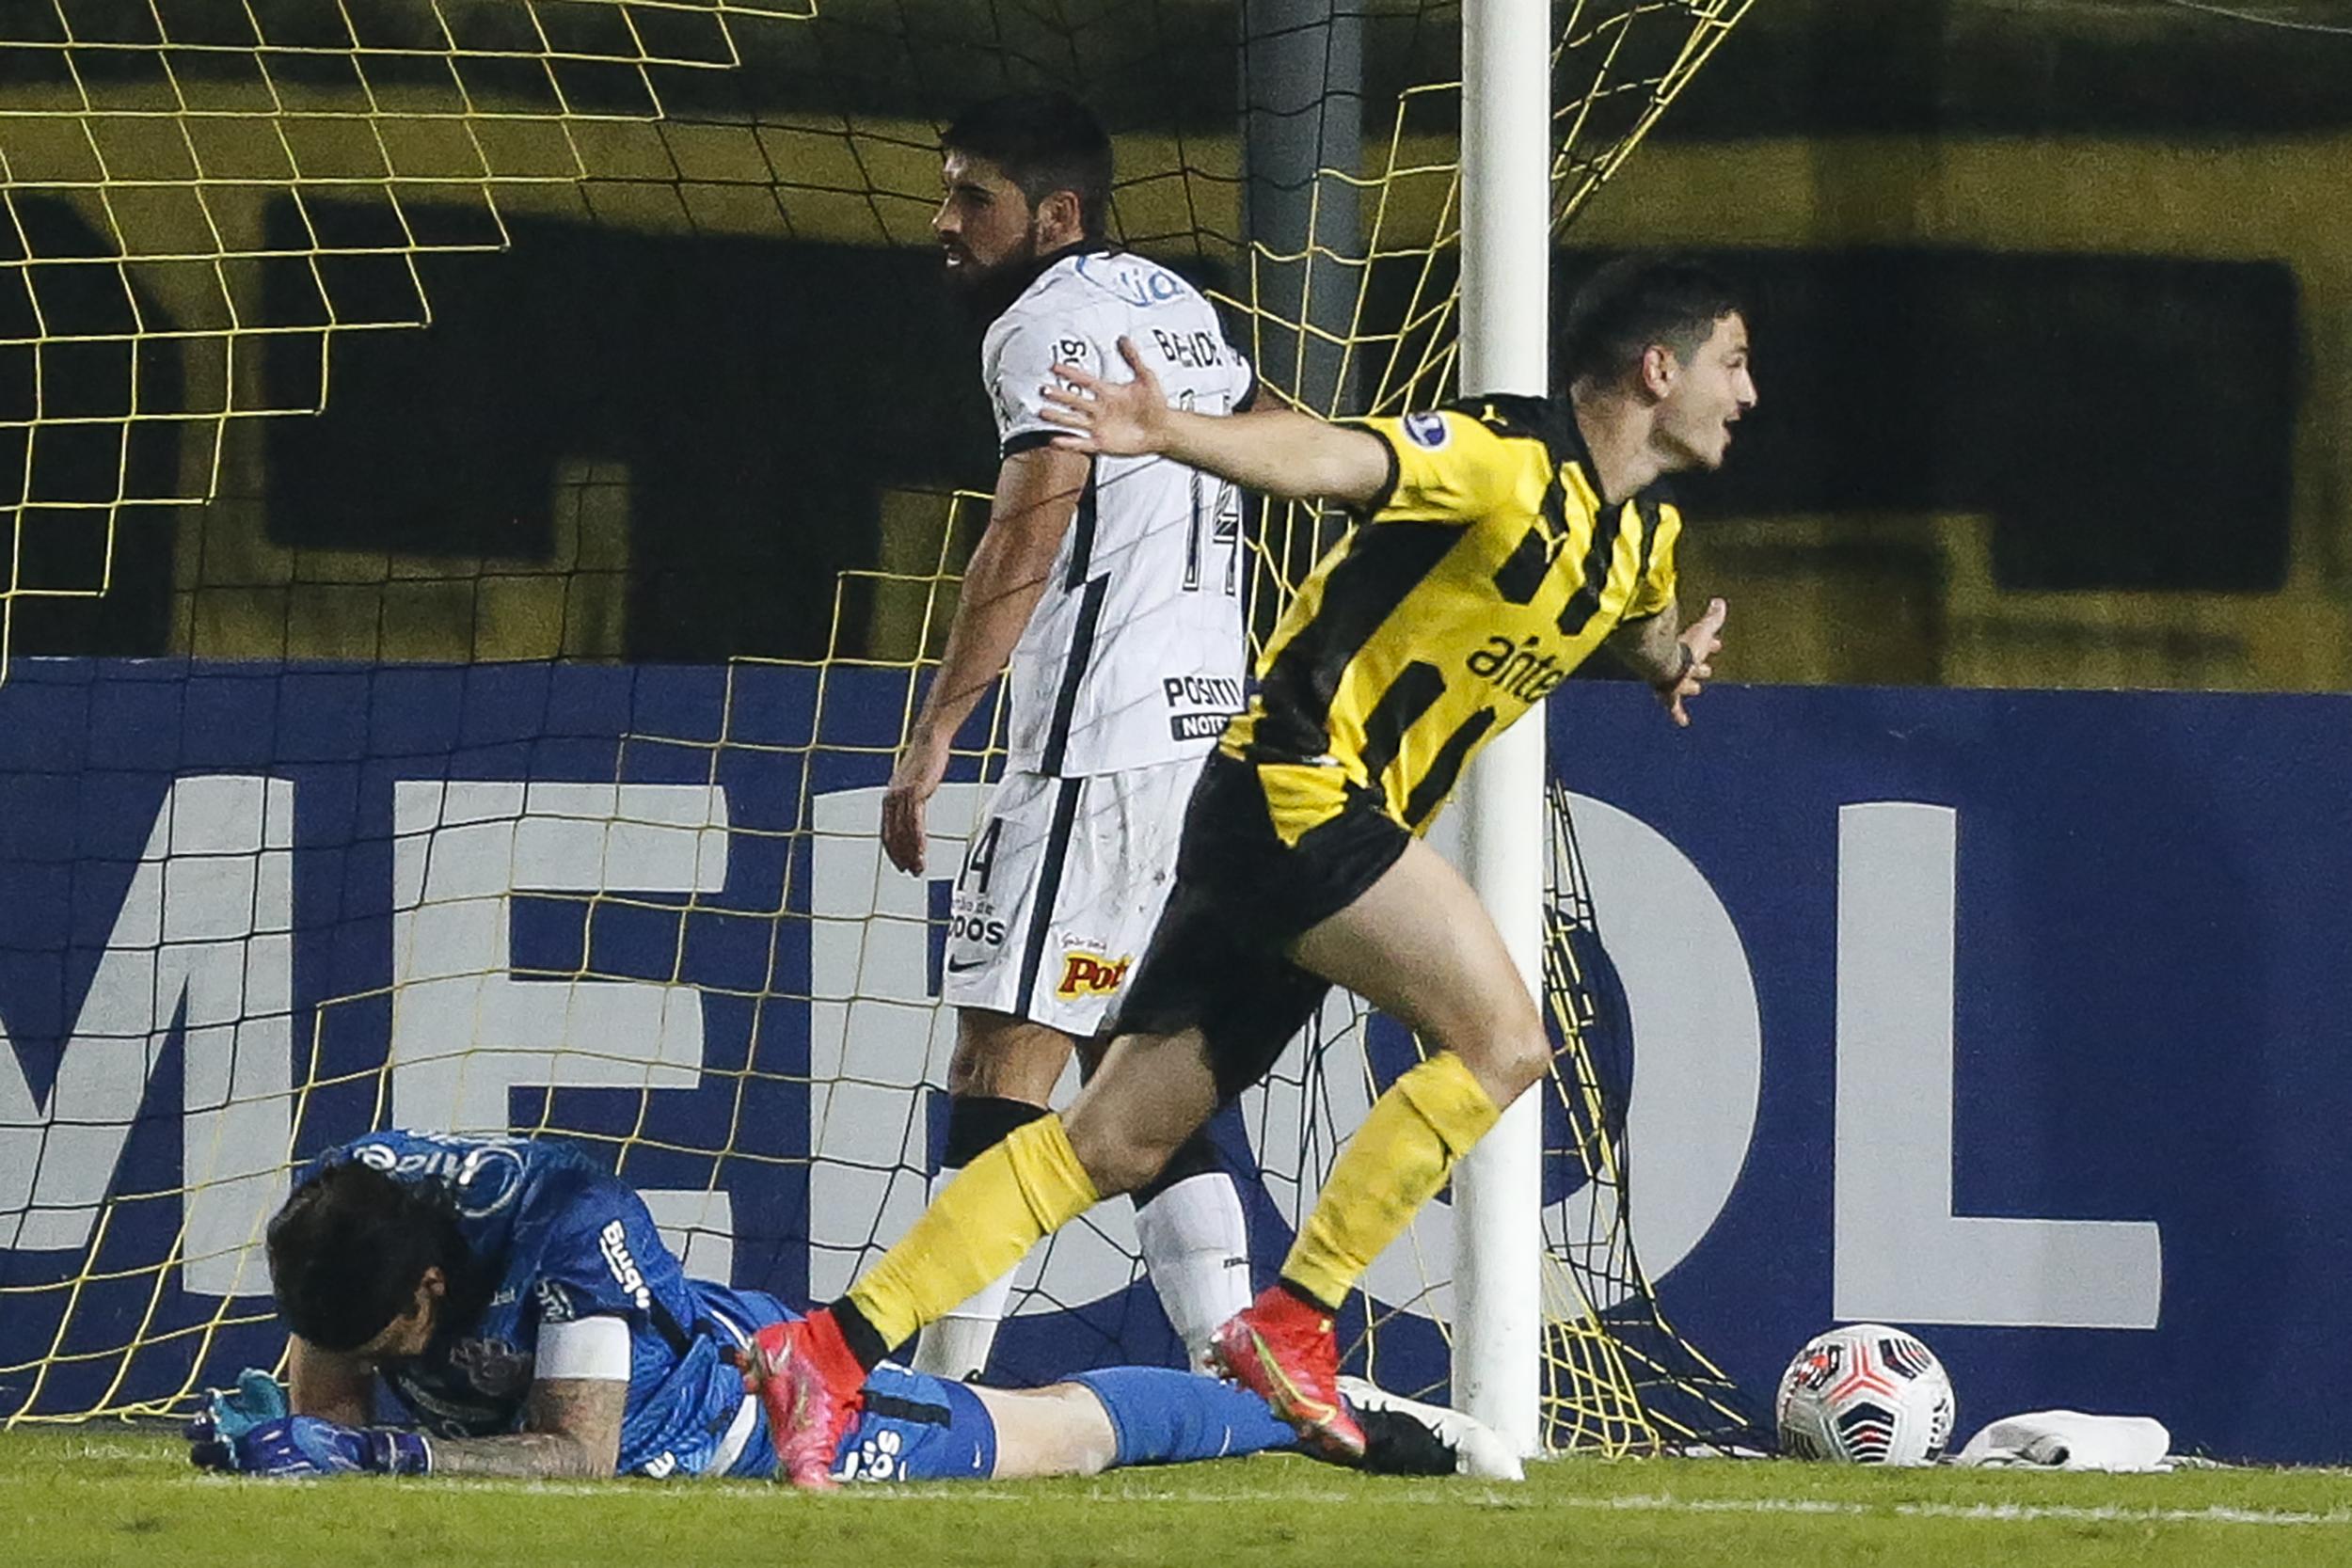 Eliminó al 'Timao': Peñarol goleó 4-0 a Corinthians por la Copa Sudamericana